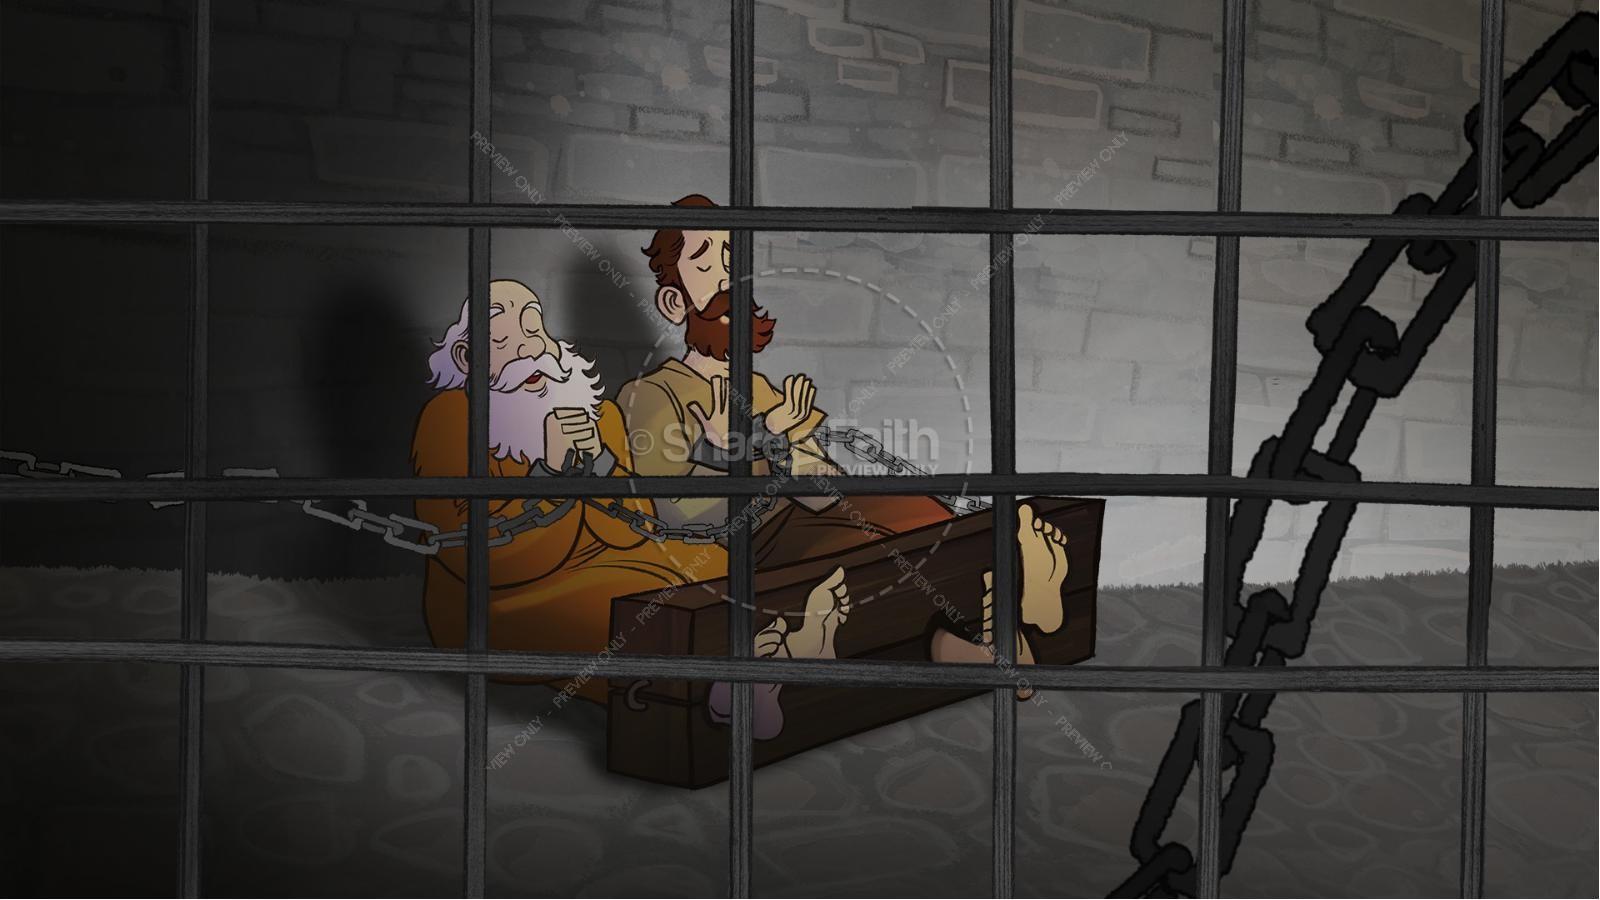 Acts 16 Prison Break Kids Bible Story | slide 5